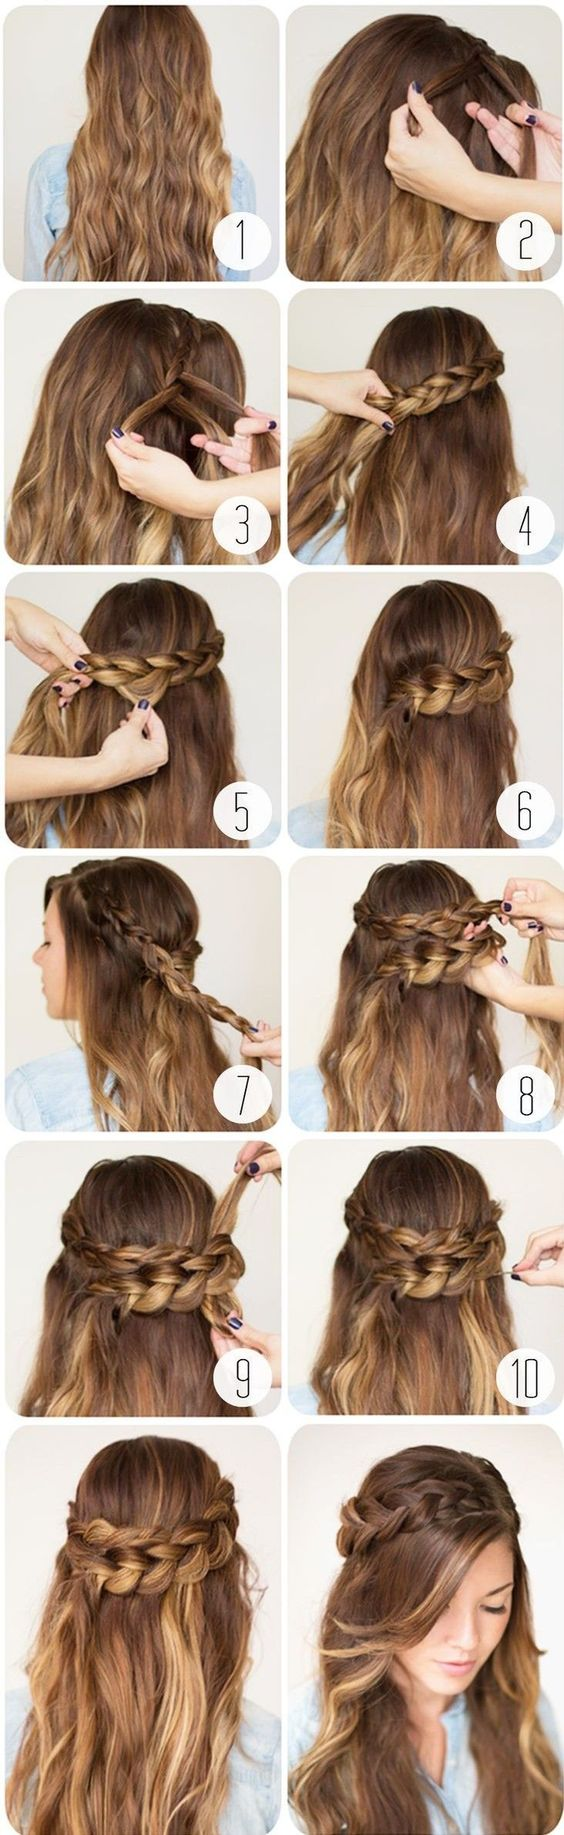 9 Pinterest – Inspired Braid Hairstyles - http://1pic4u.com/2015/09/05/9-pinterest-inspired-braid-hairstyles/